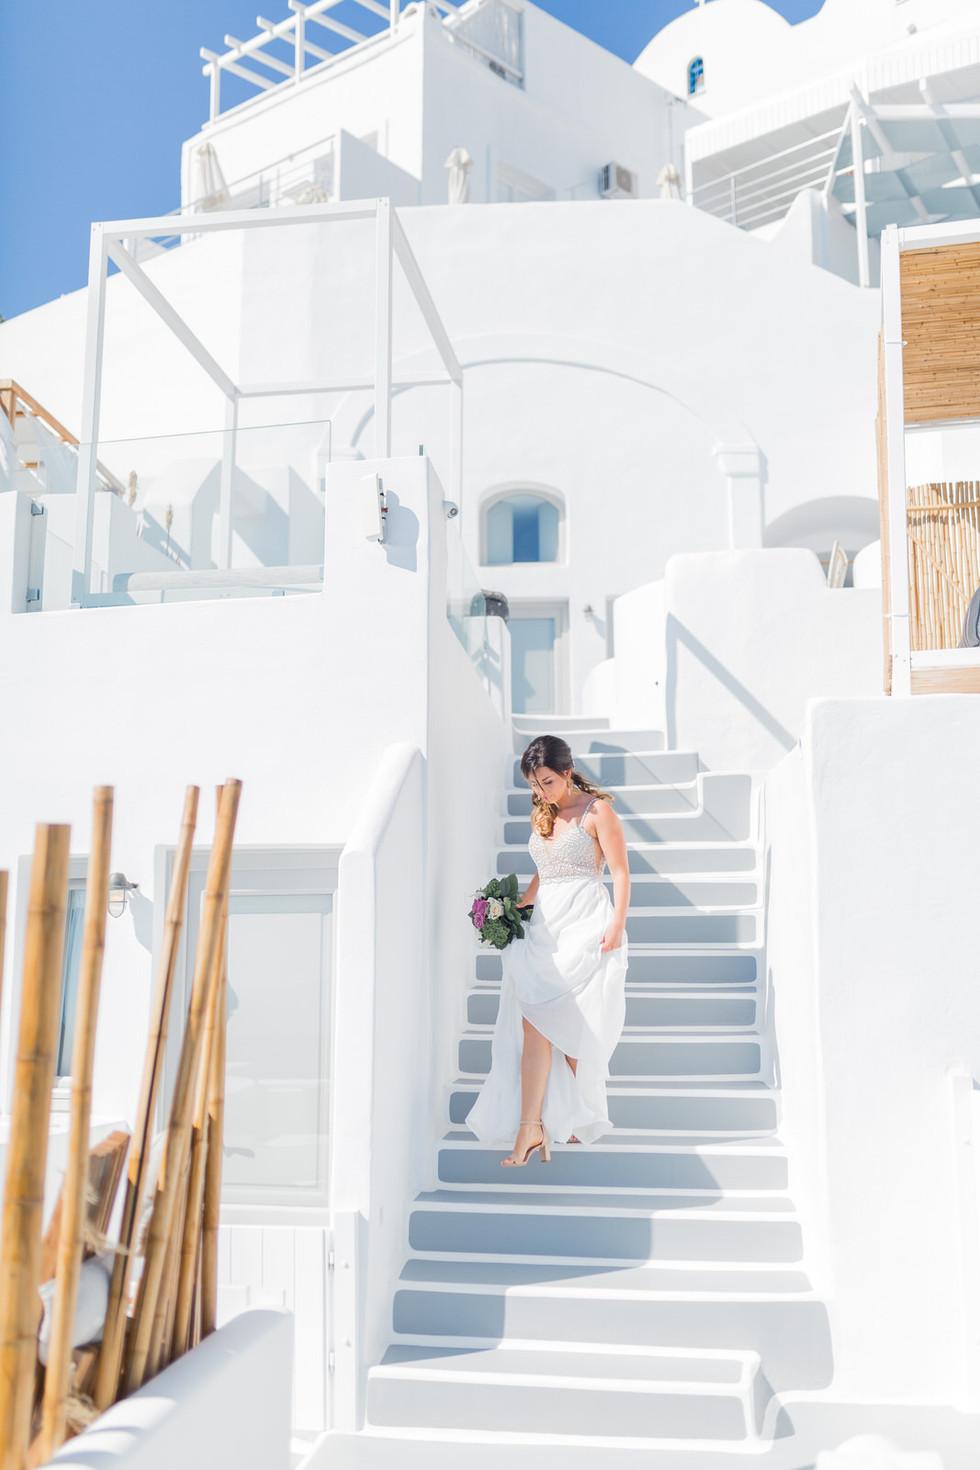 Santorini-Elopement- wedding-133.jpg